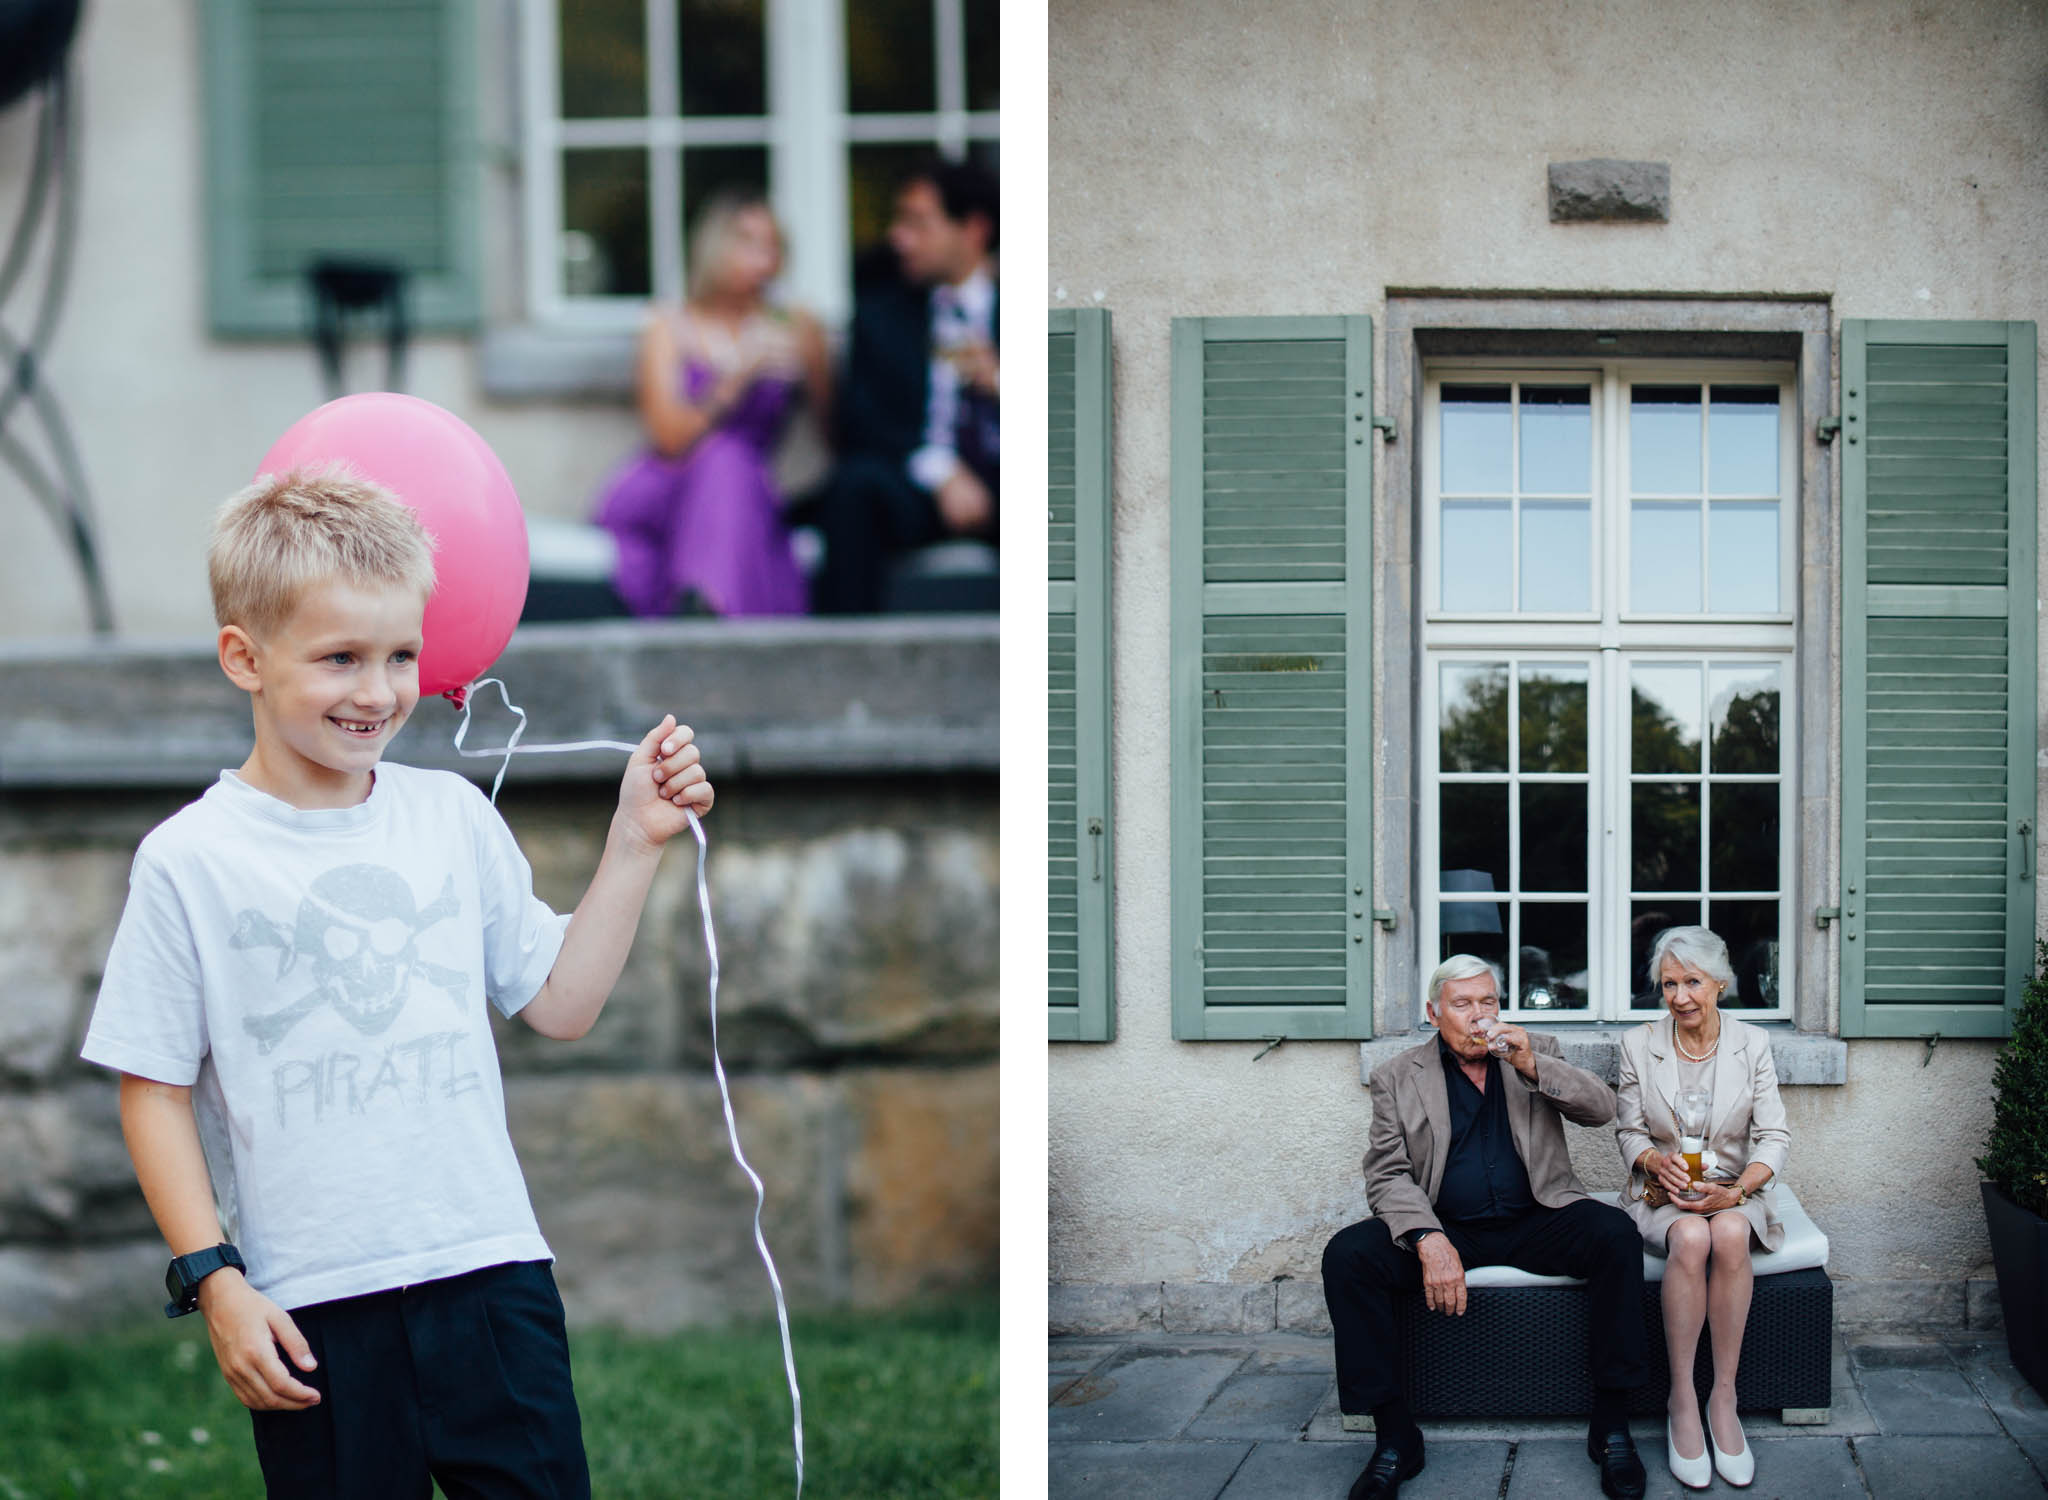 hochzeit-ballons-bunt-feiern-reportage-fotograf